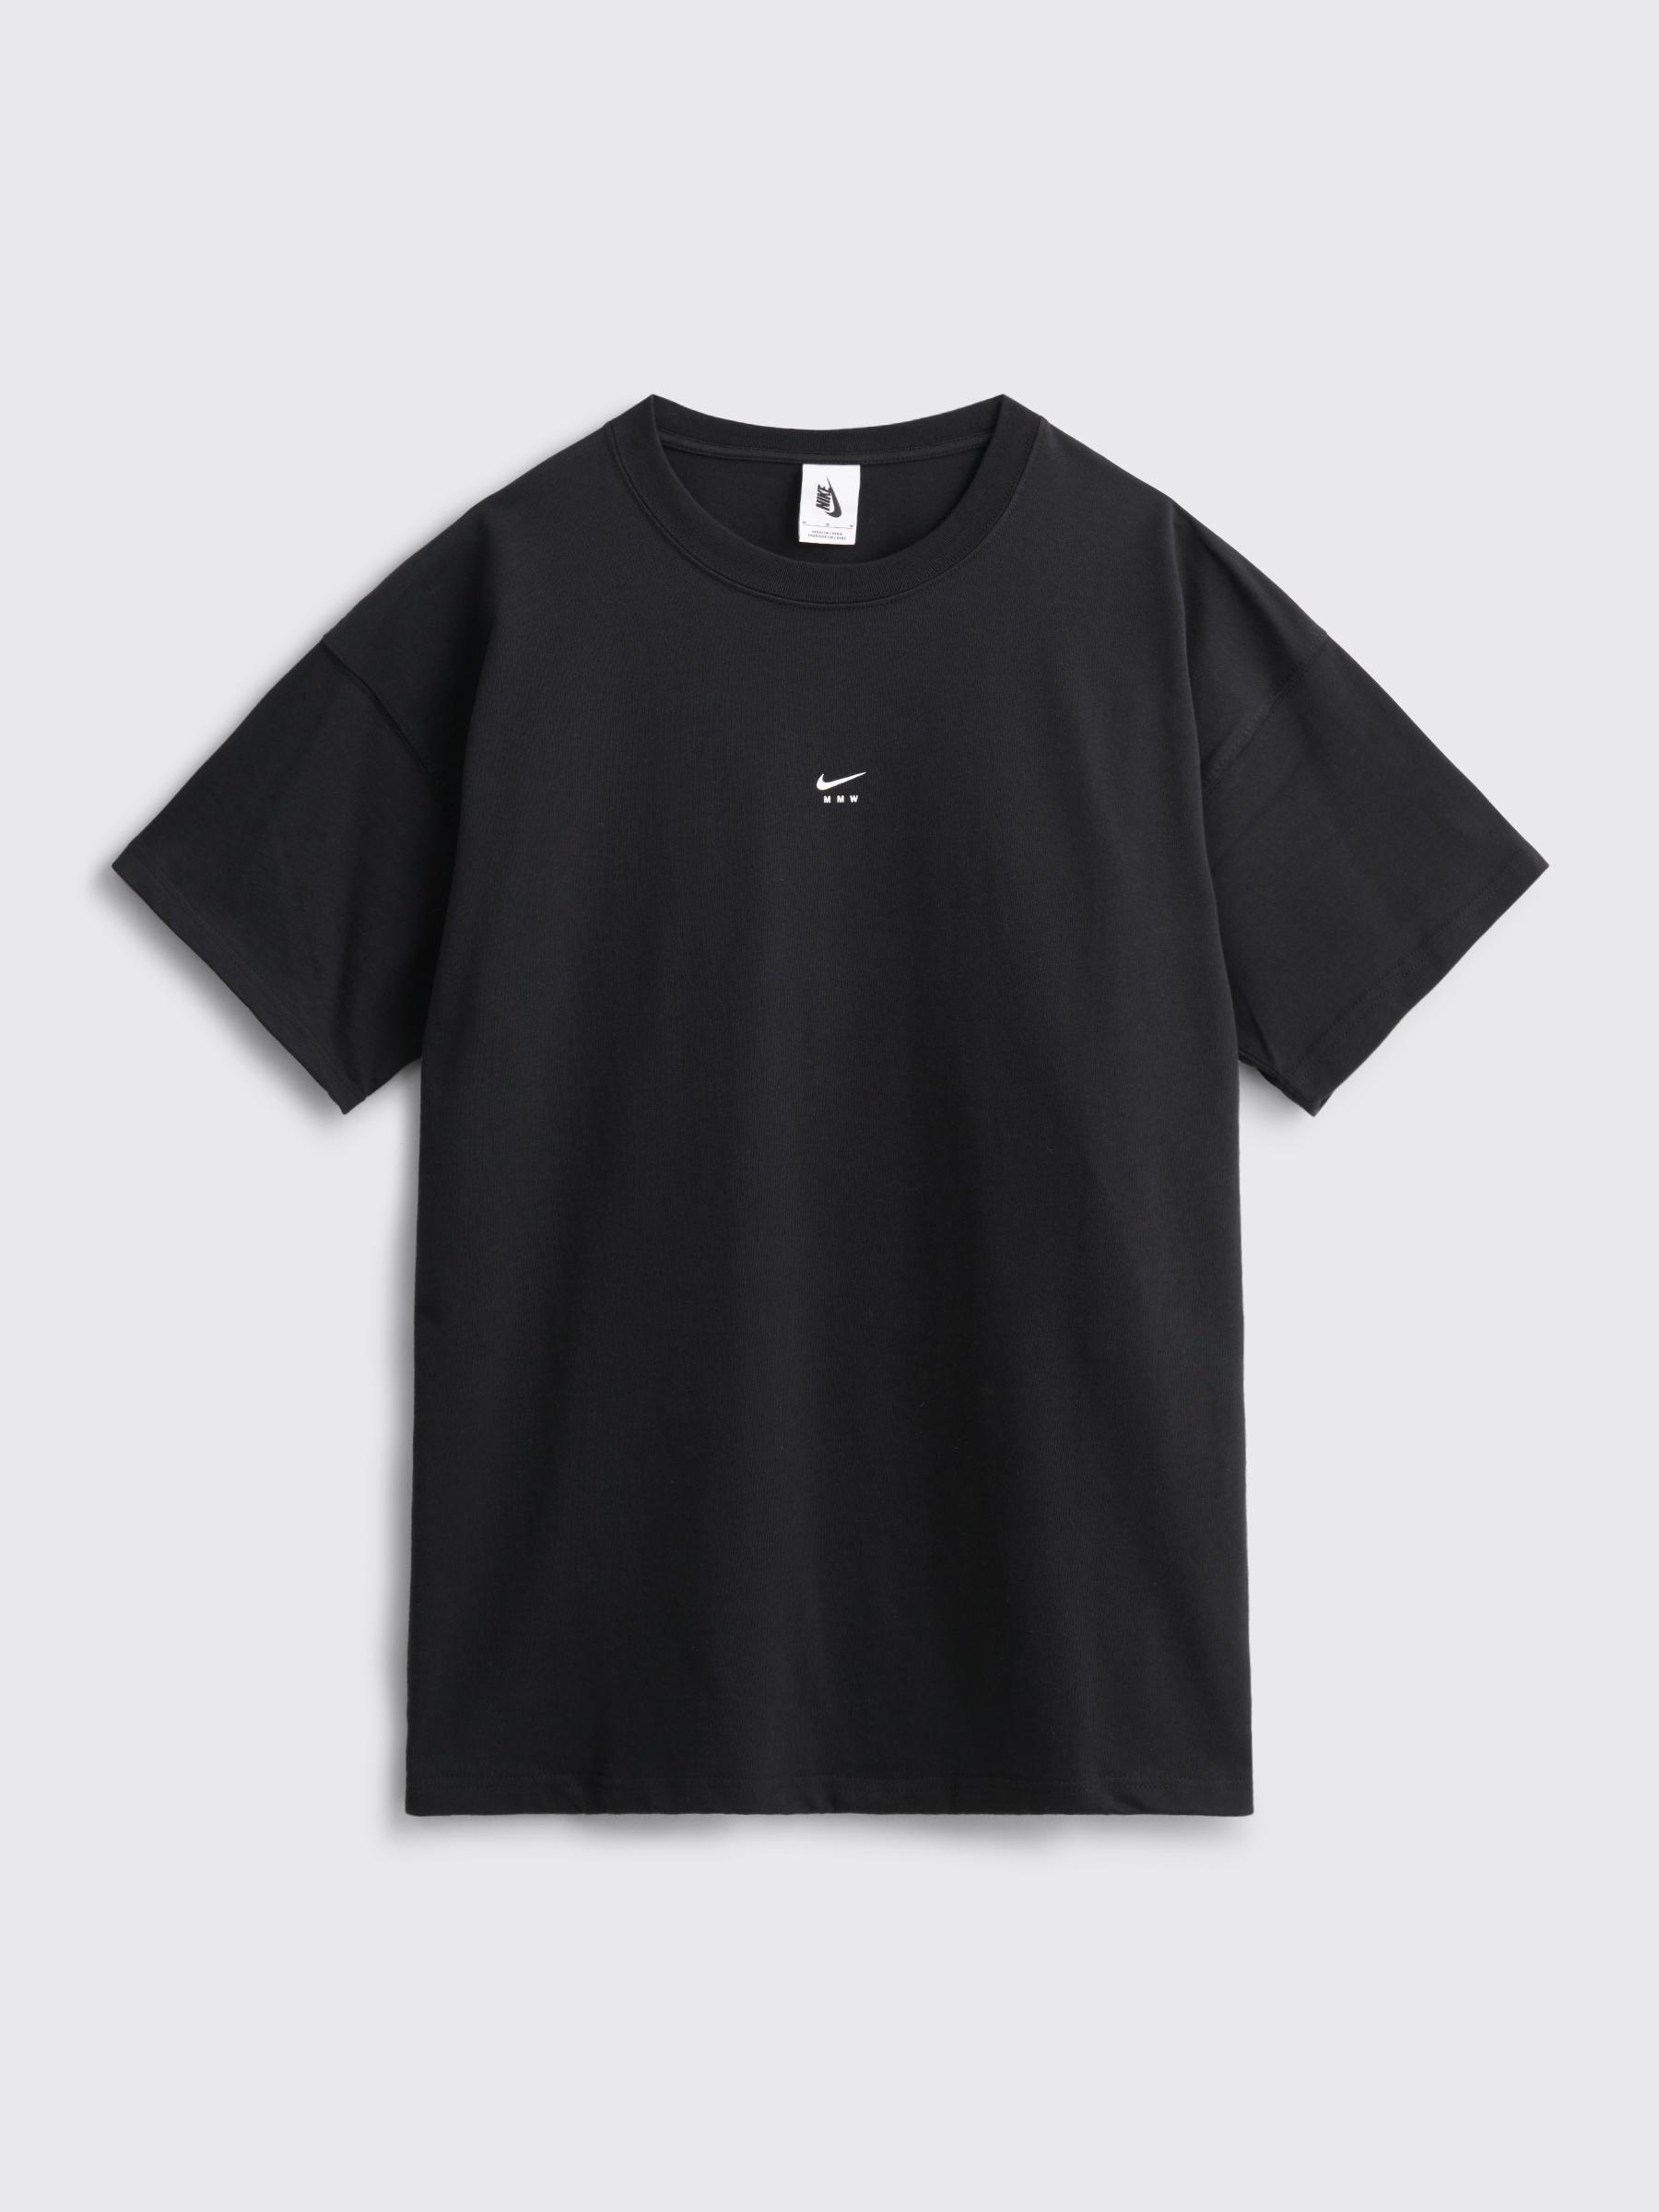 Nike x MMW NRG T shirt Black